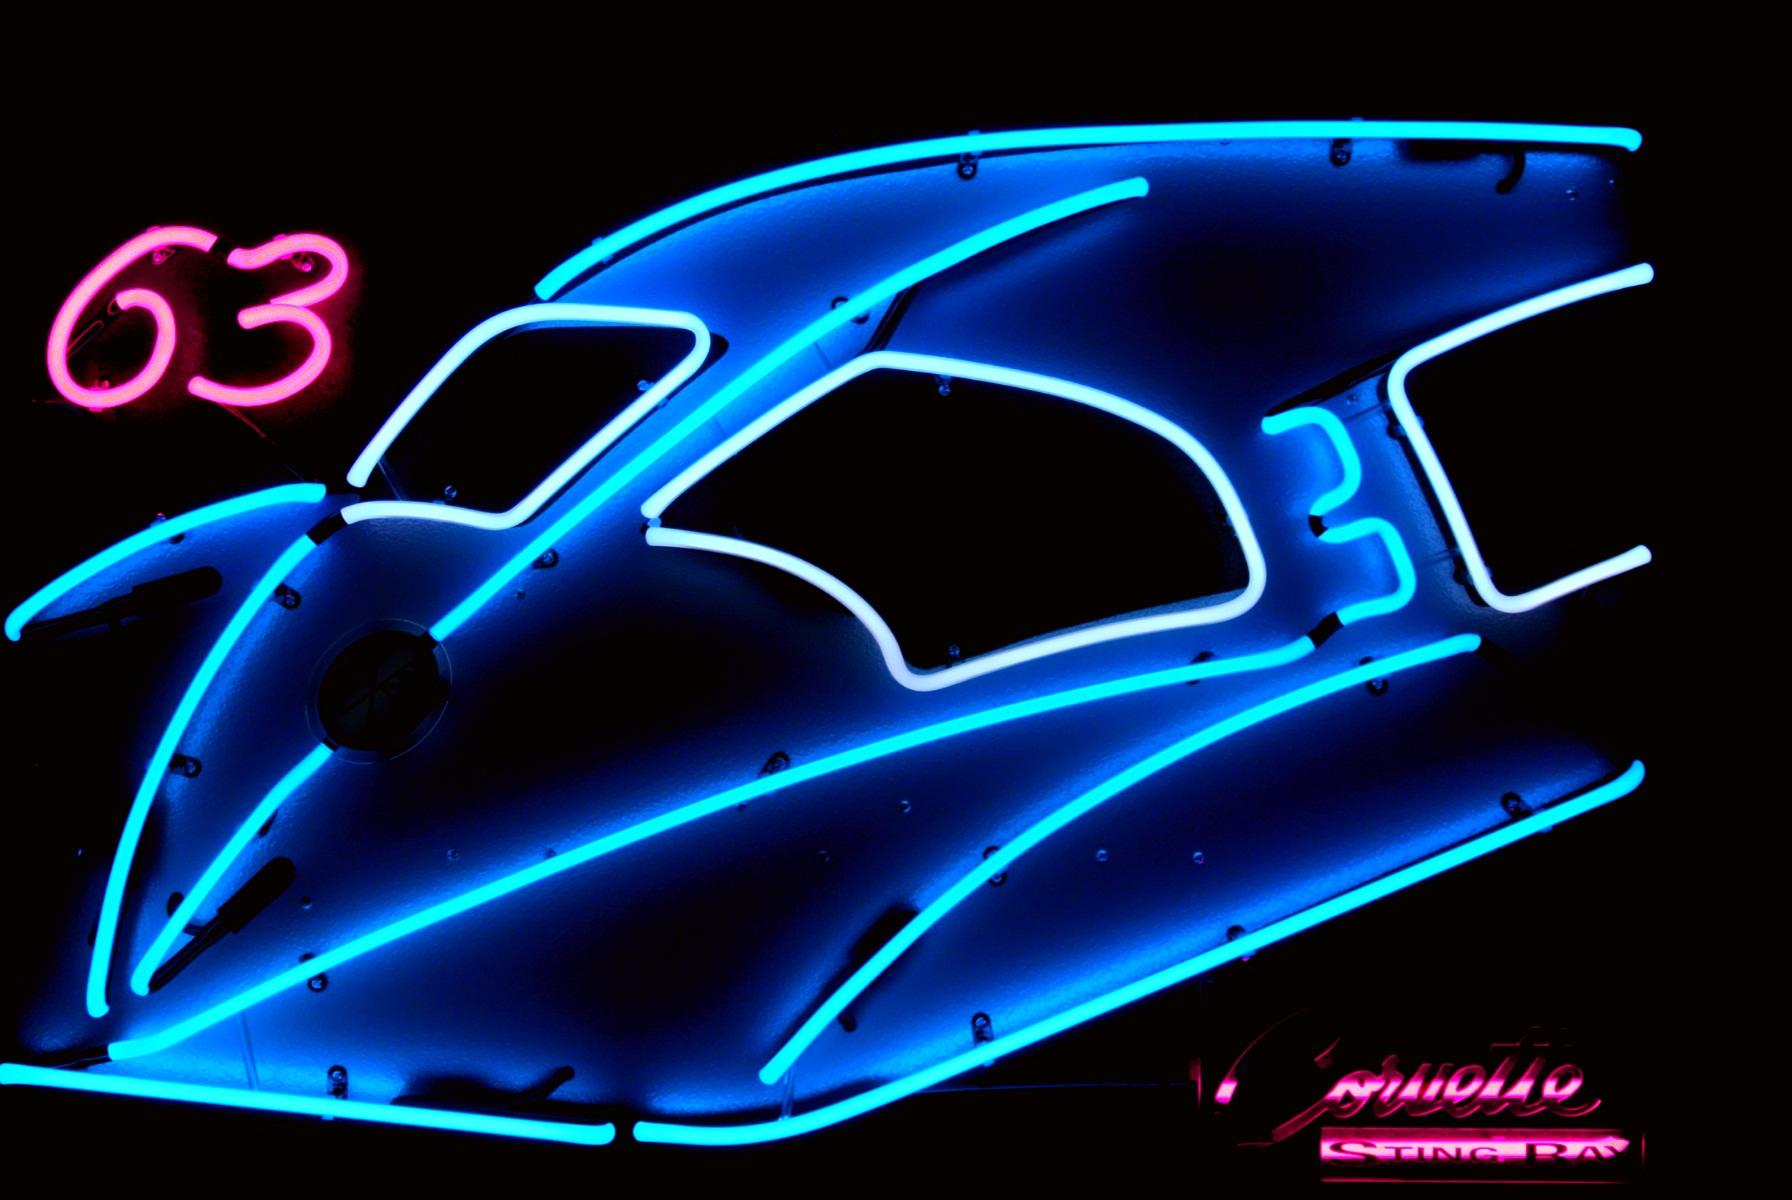 Custom Neon Exotic Car Sculptures by John Barton - BartonNeonMagic.com